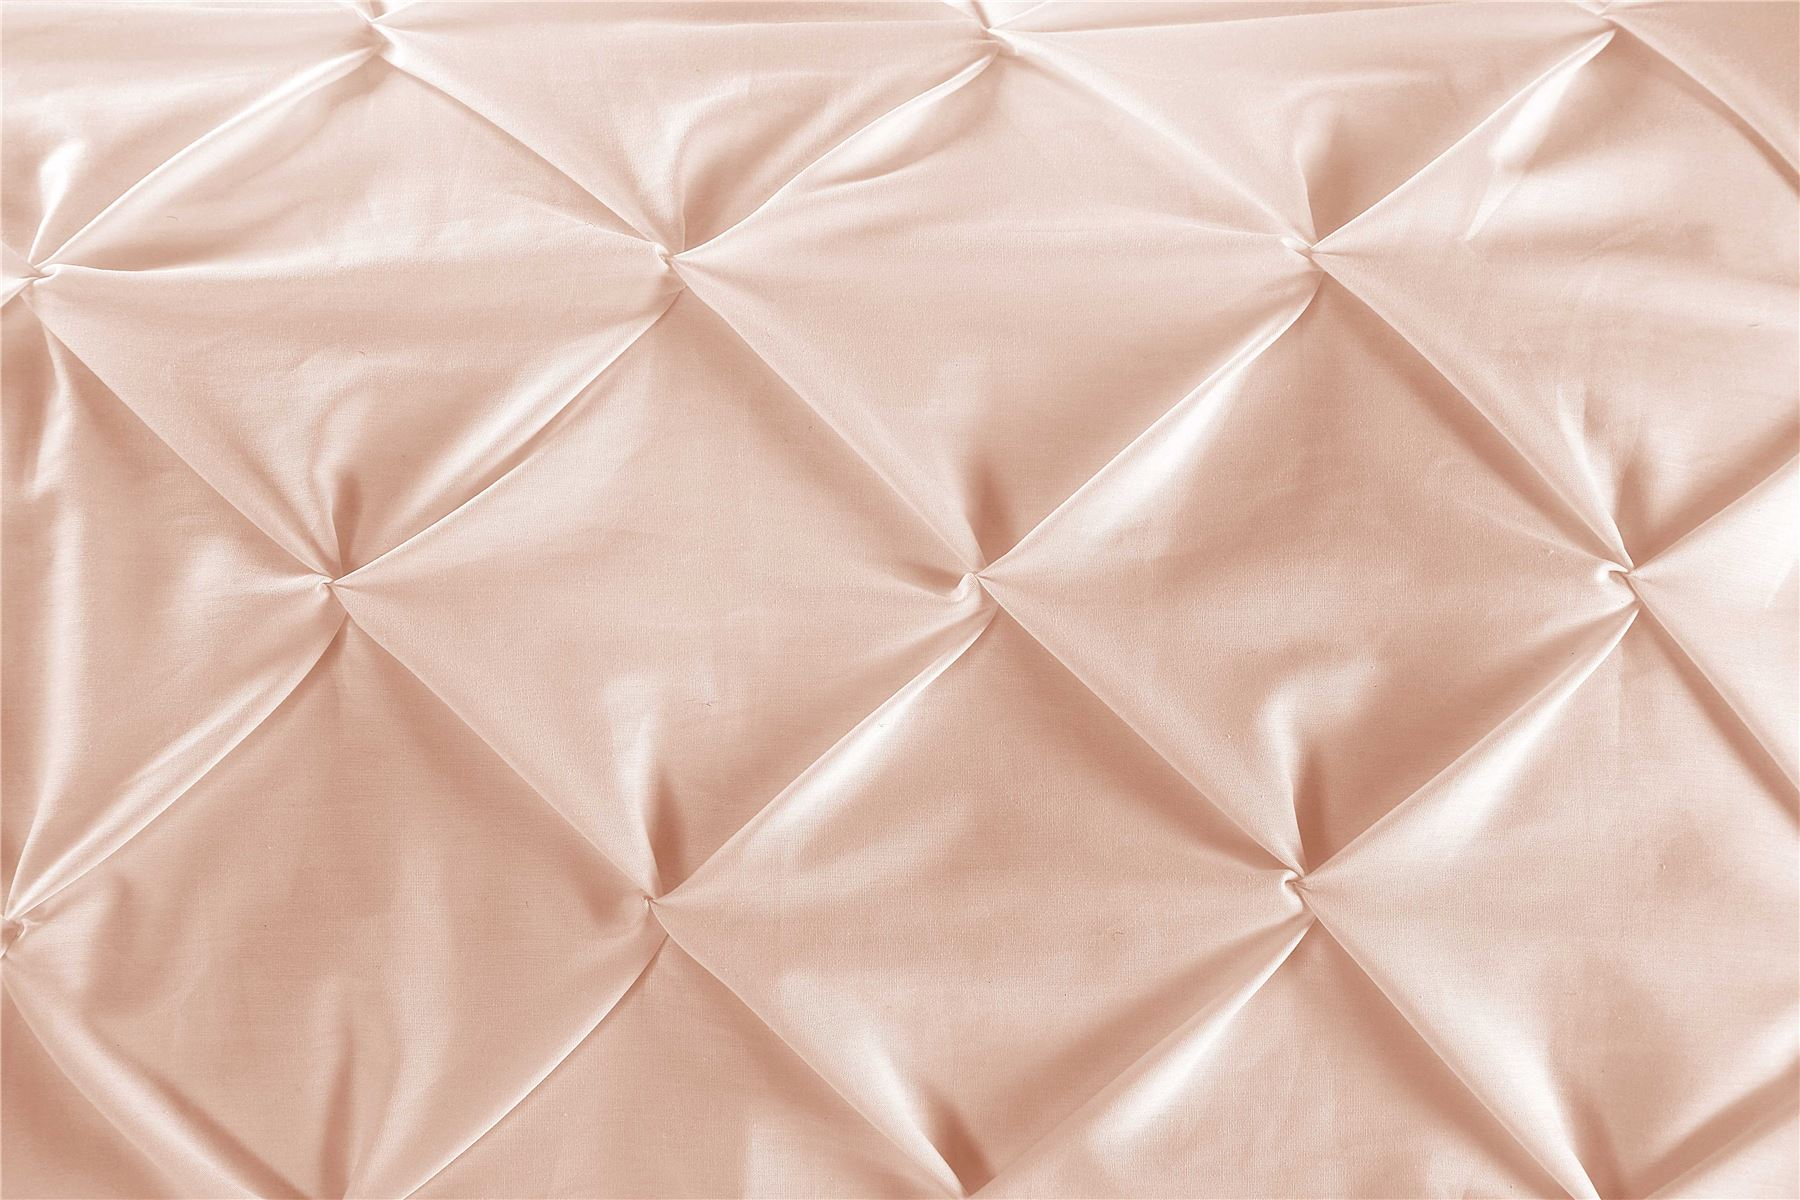 Luxury-Pure-100-Cotton-200-Thread-Pinch-Pleat-Pintuck-Puckering-Duvet-Cover-Set thumbnail 6